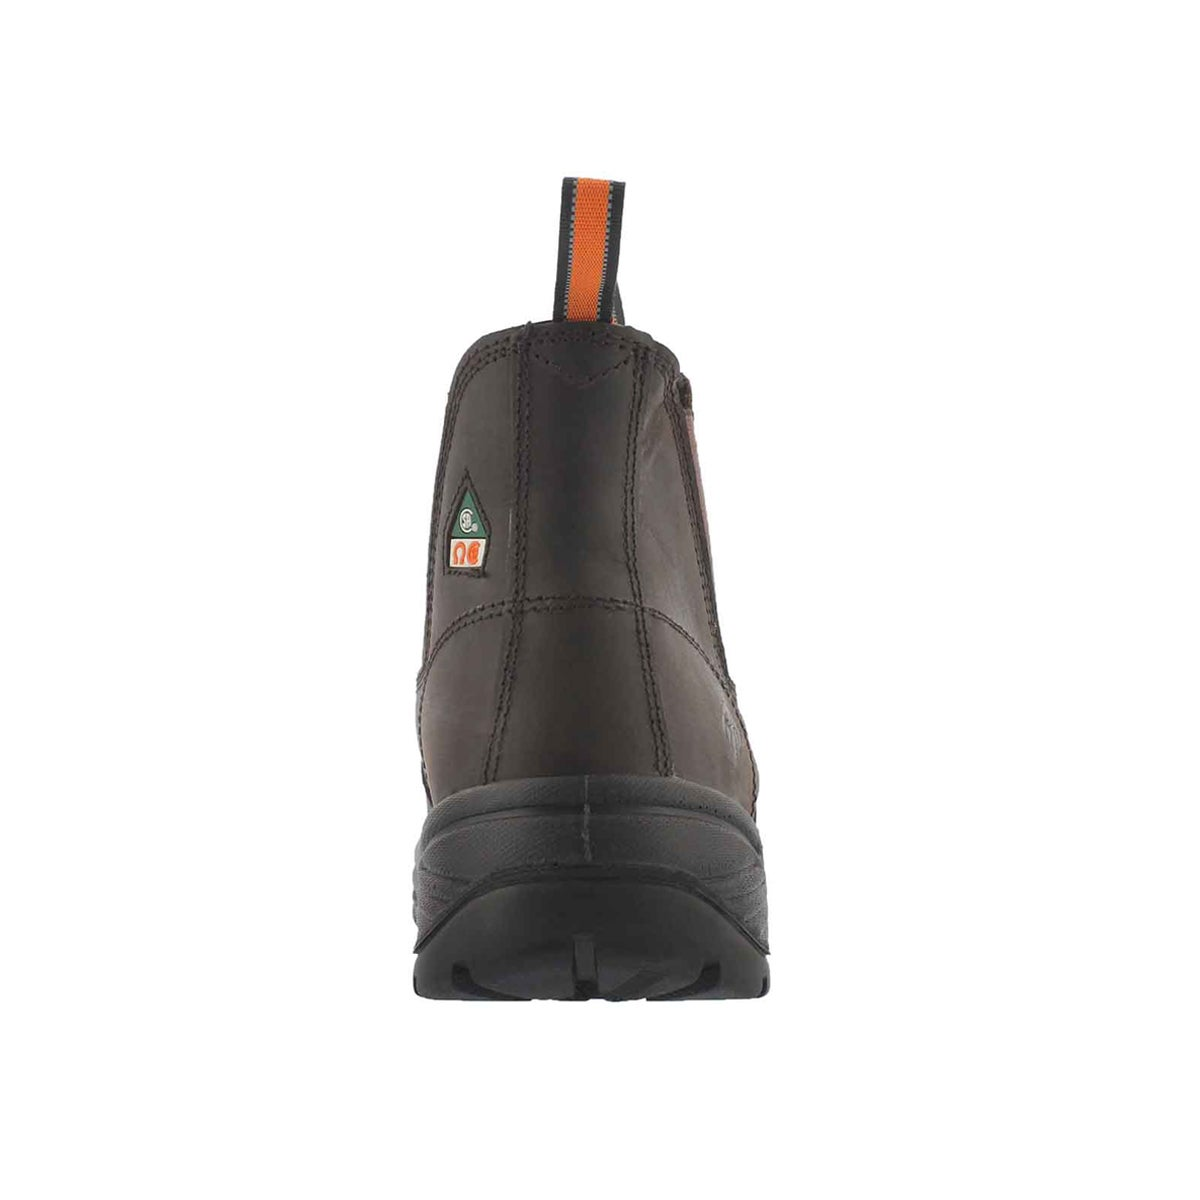 Mns Stud II brn CSA safety chelsea boot